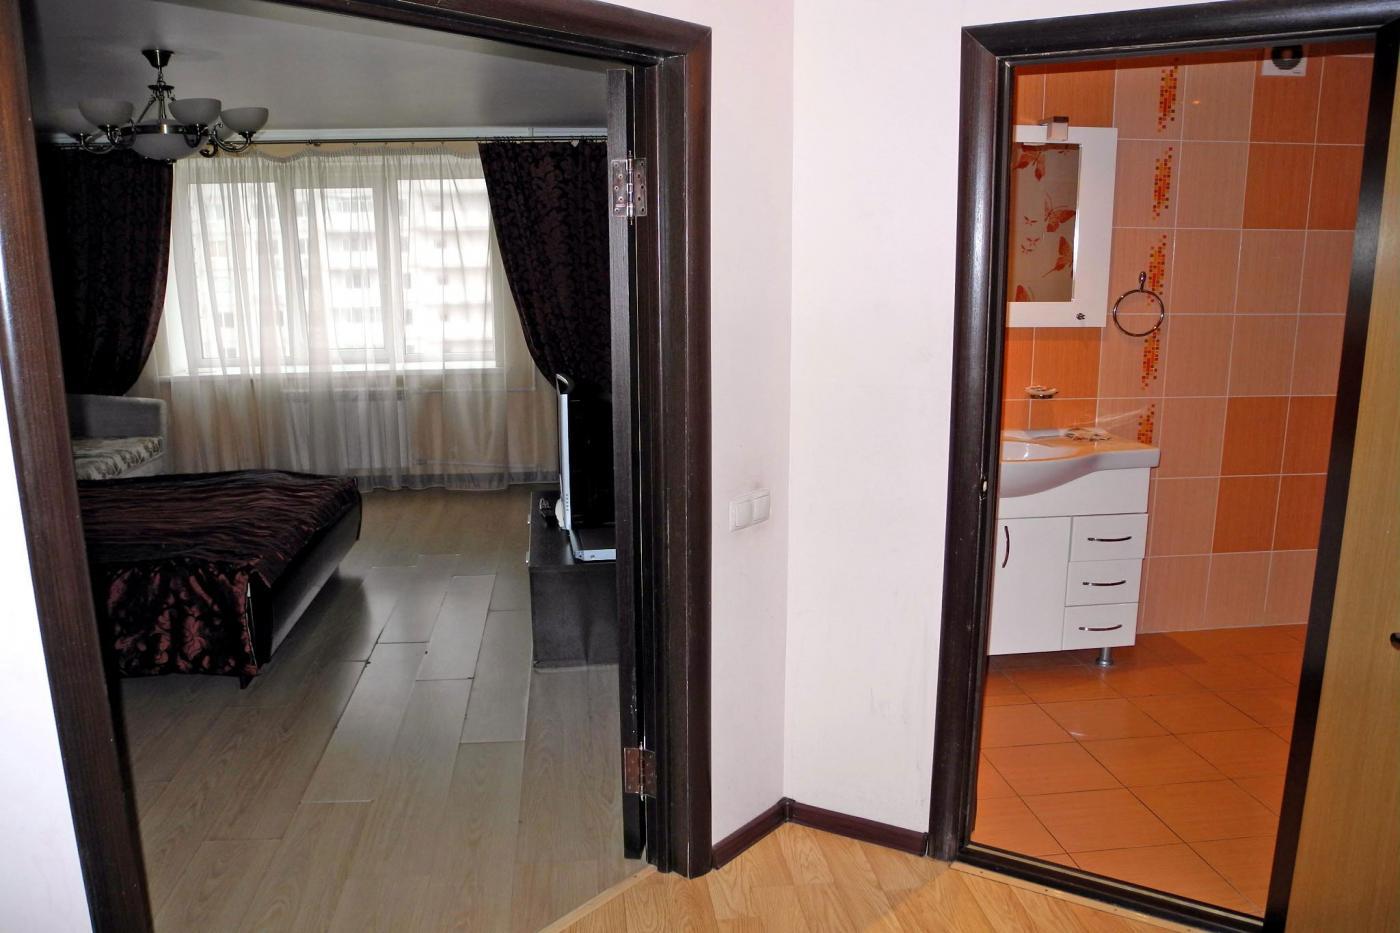 2-комнатная квартира посуточно (вариант № 3876), ул. Войкова улица, фото № 9